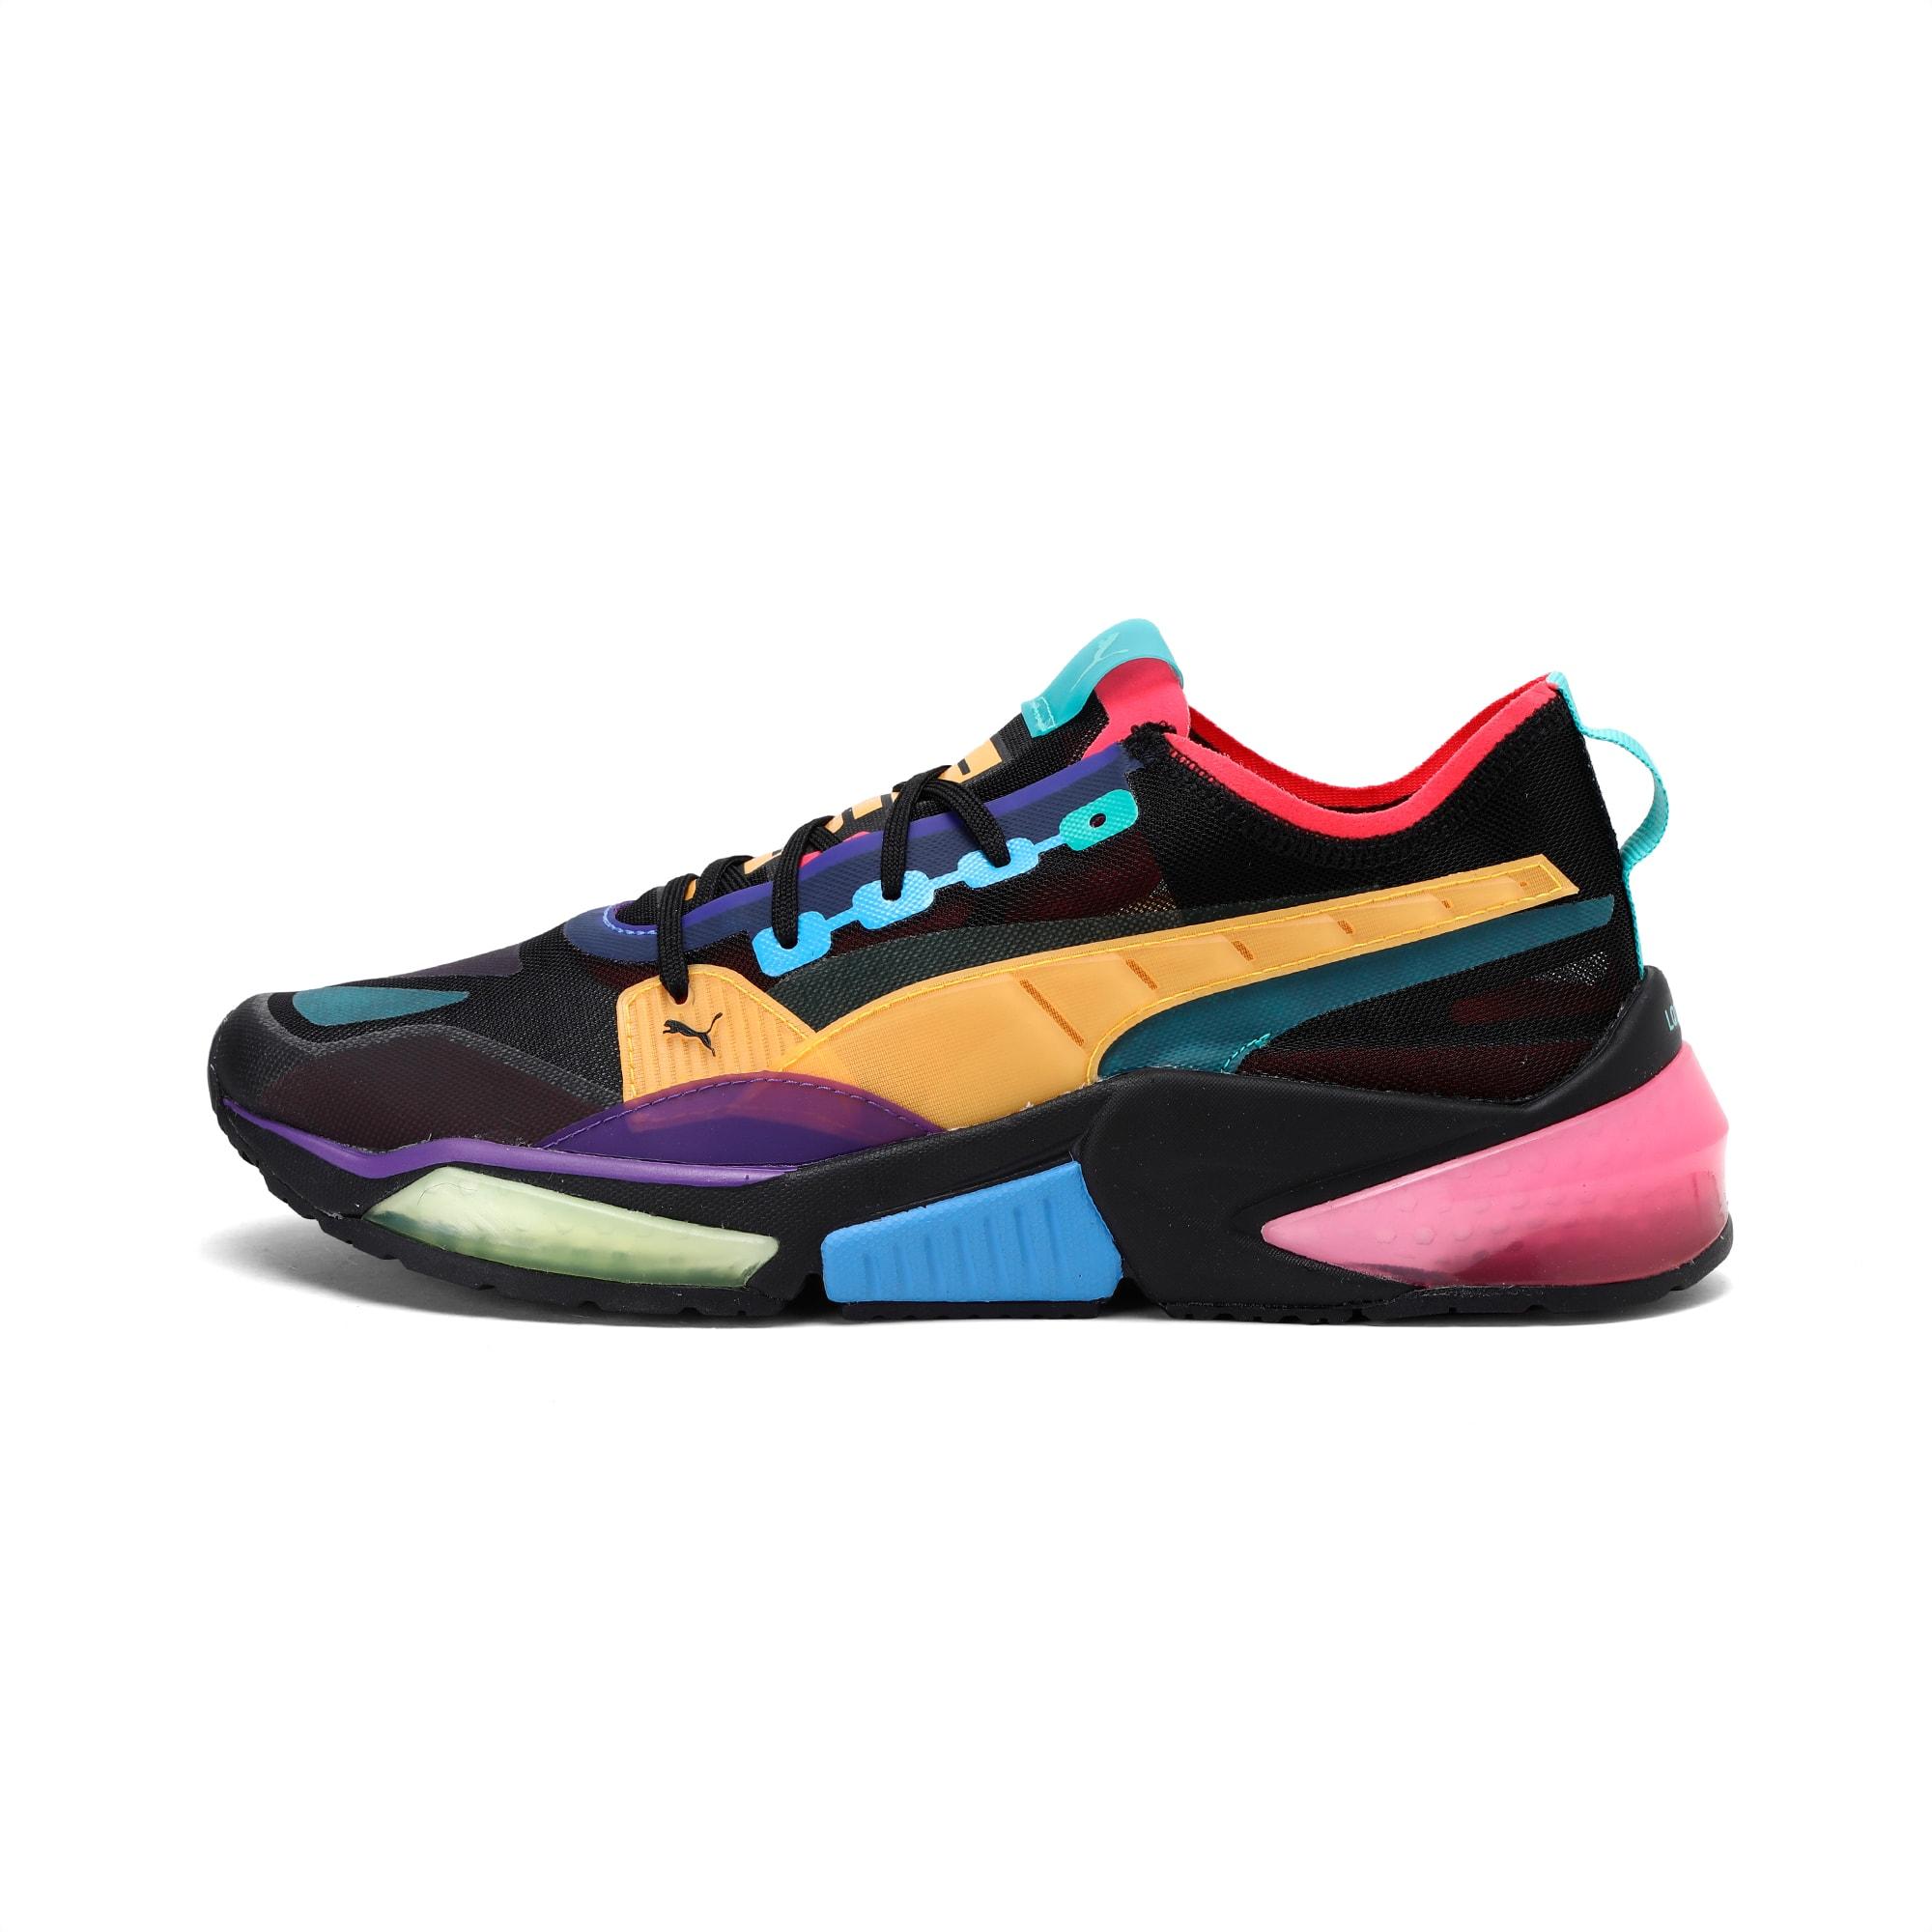 NEW Puma LQDCELL OPTIC SHEER Men Shoes Sz 11 192560 01 Puma White//Multicolor